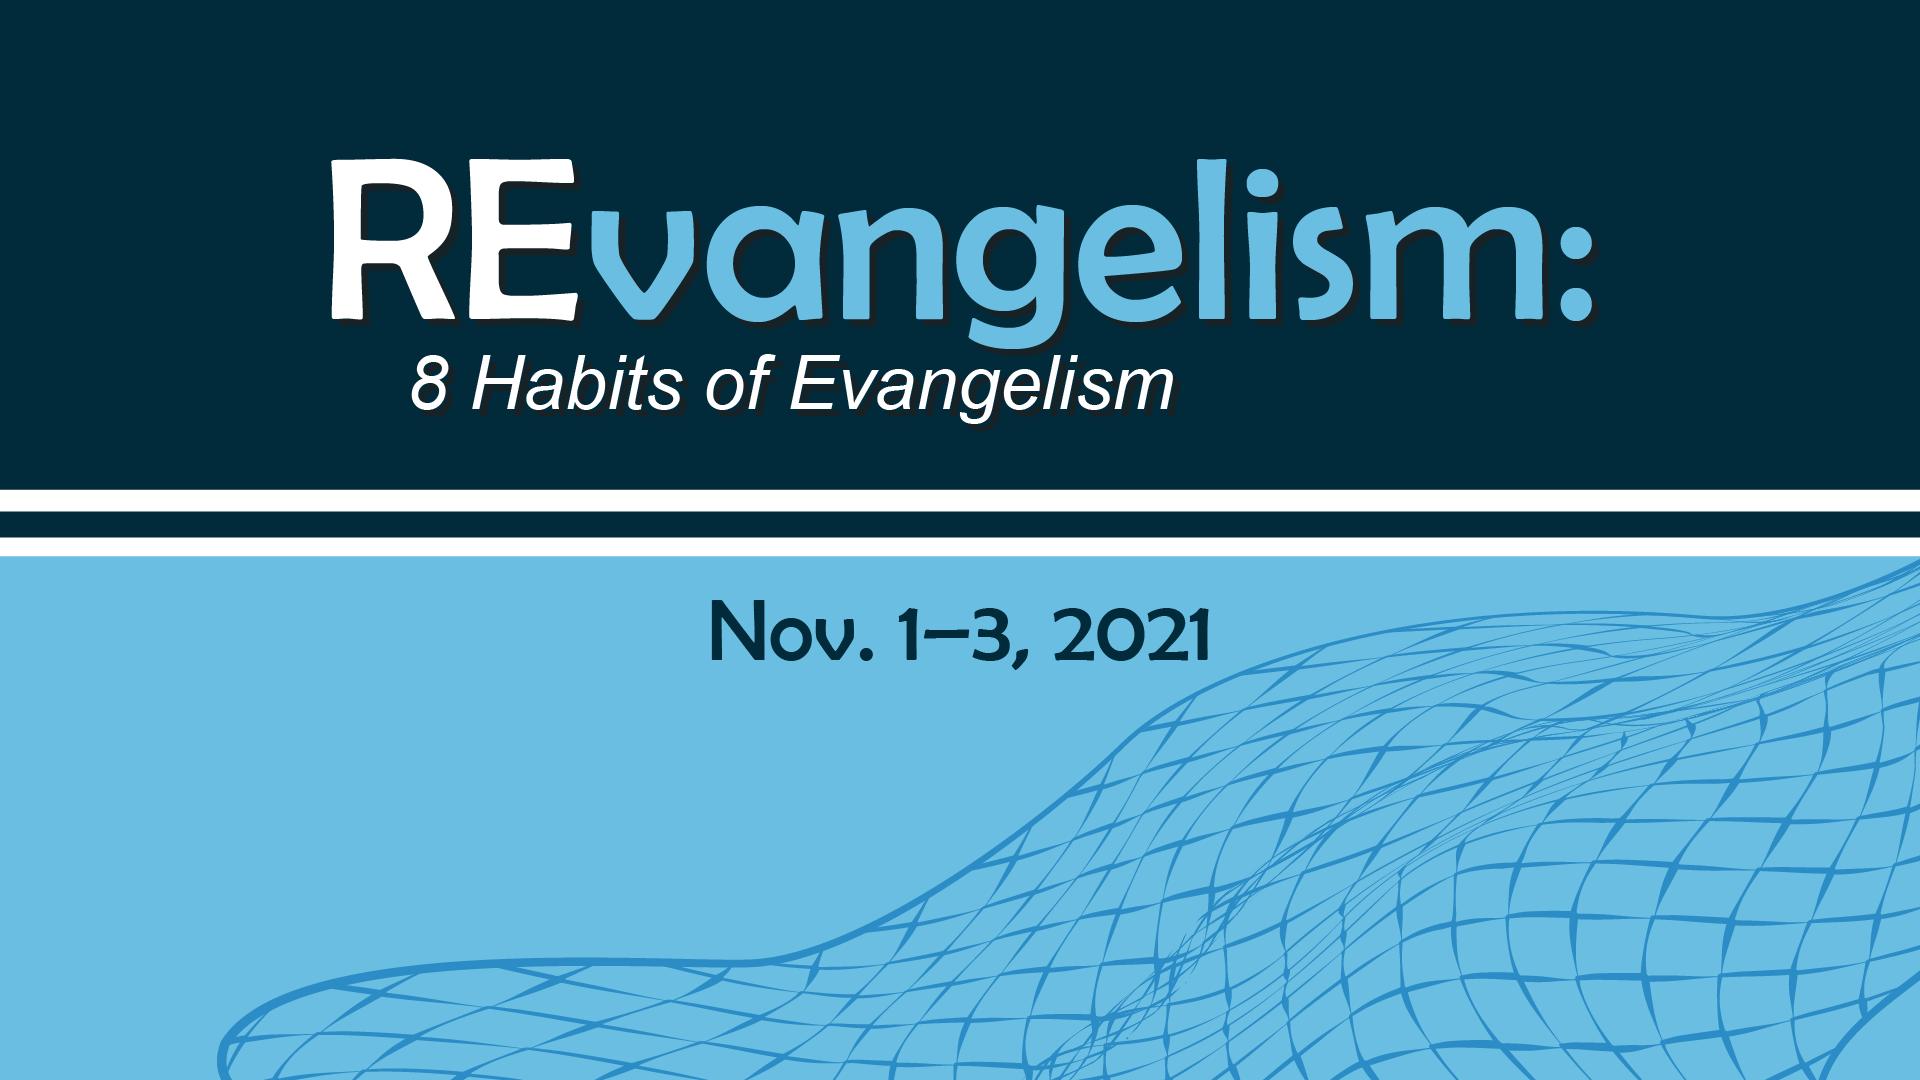 REvangelism Conference